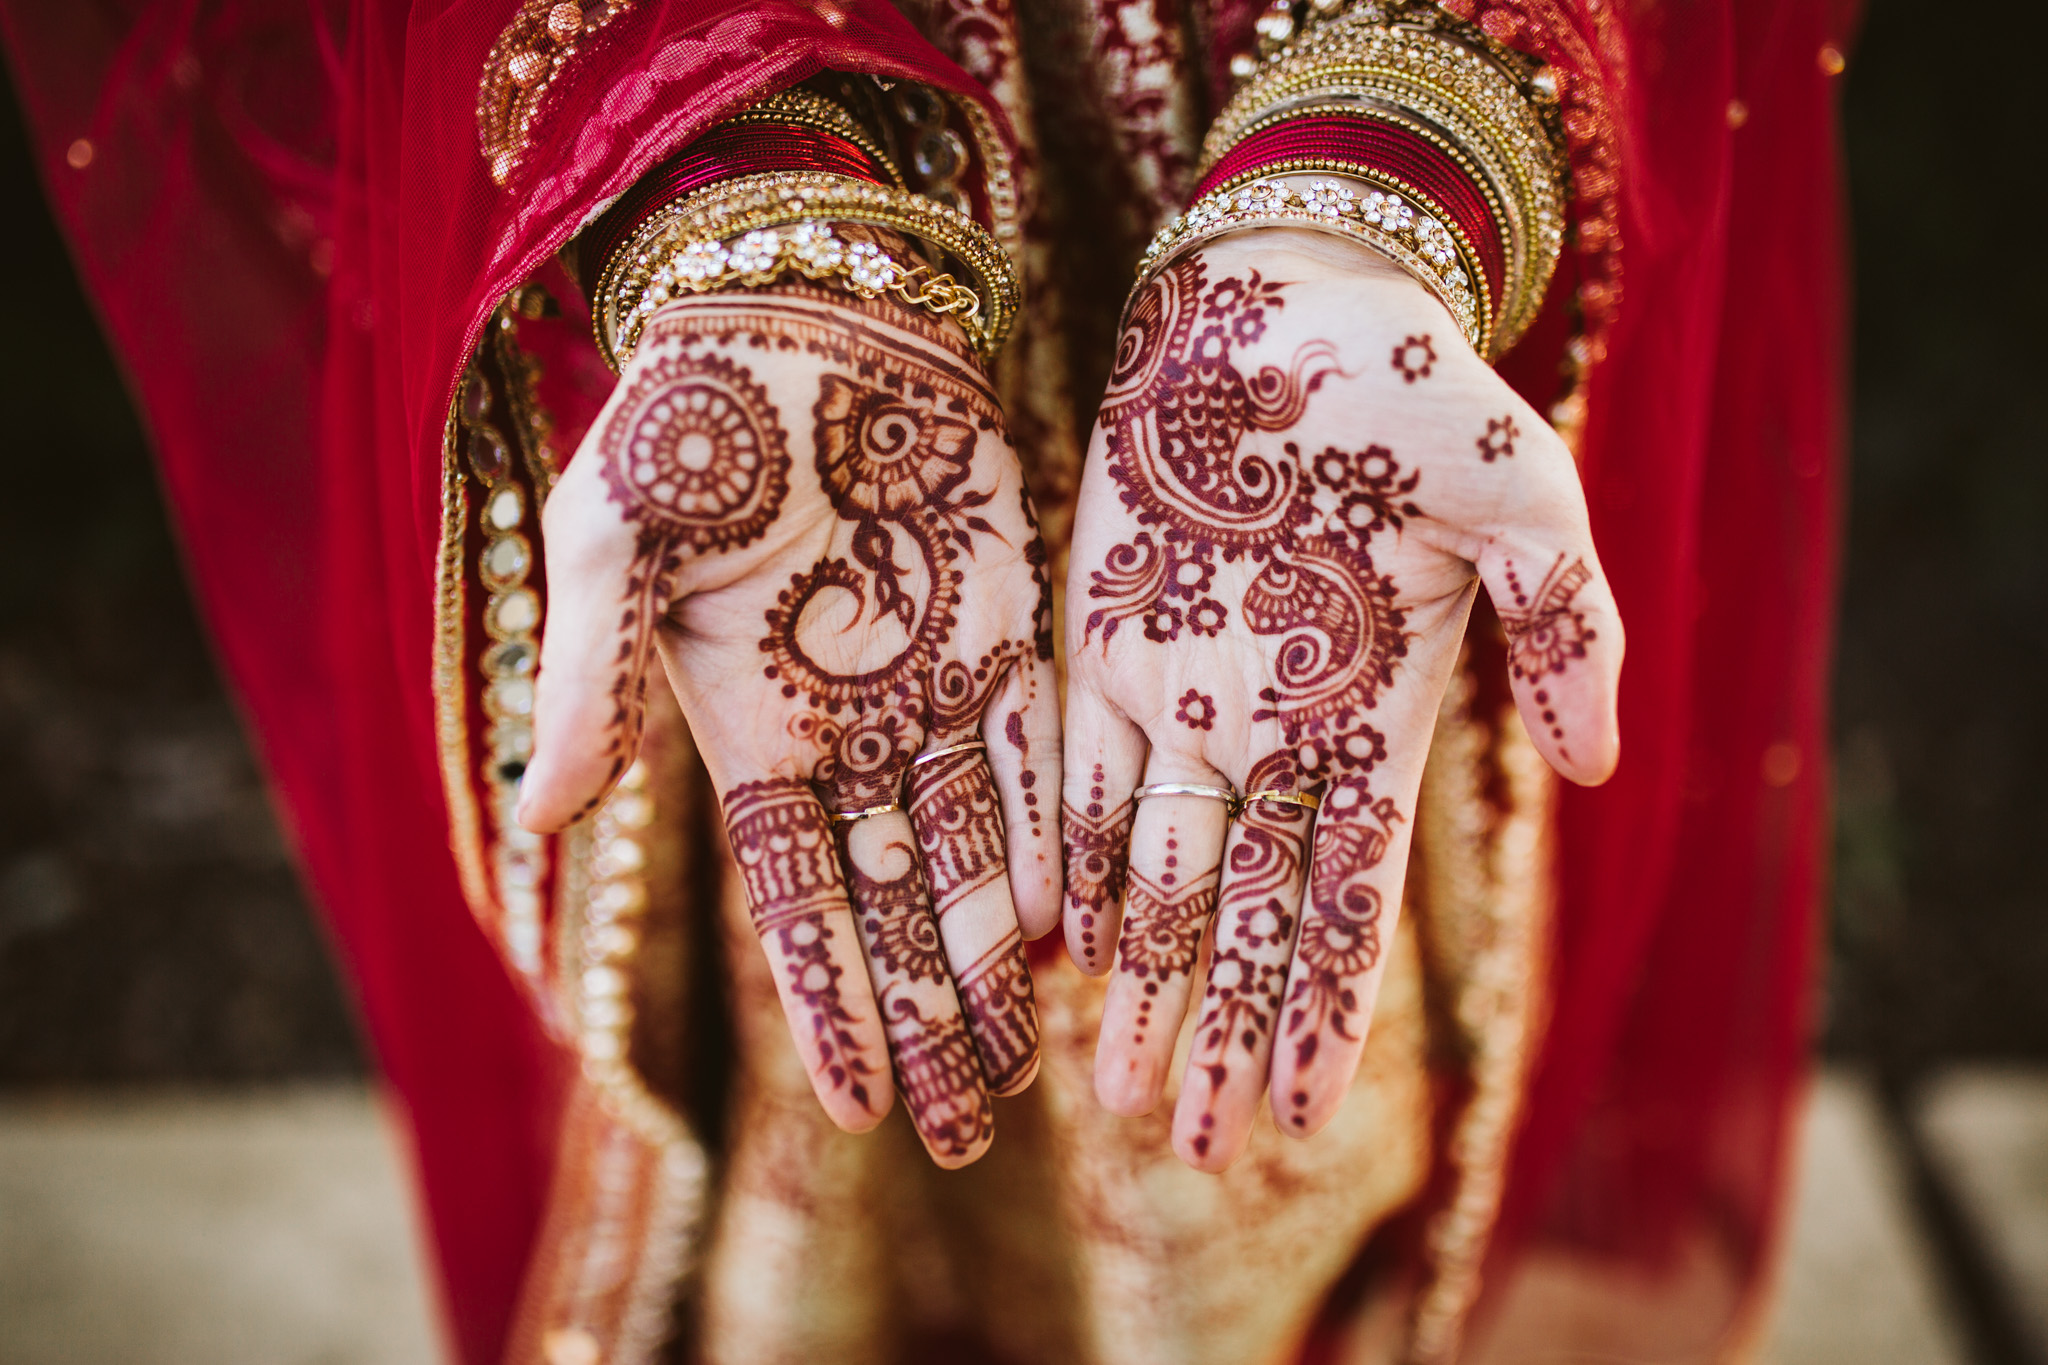 rebeccaburtphotography.hindiwedding.moraisvineyards.virginiawedding-56.JPG